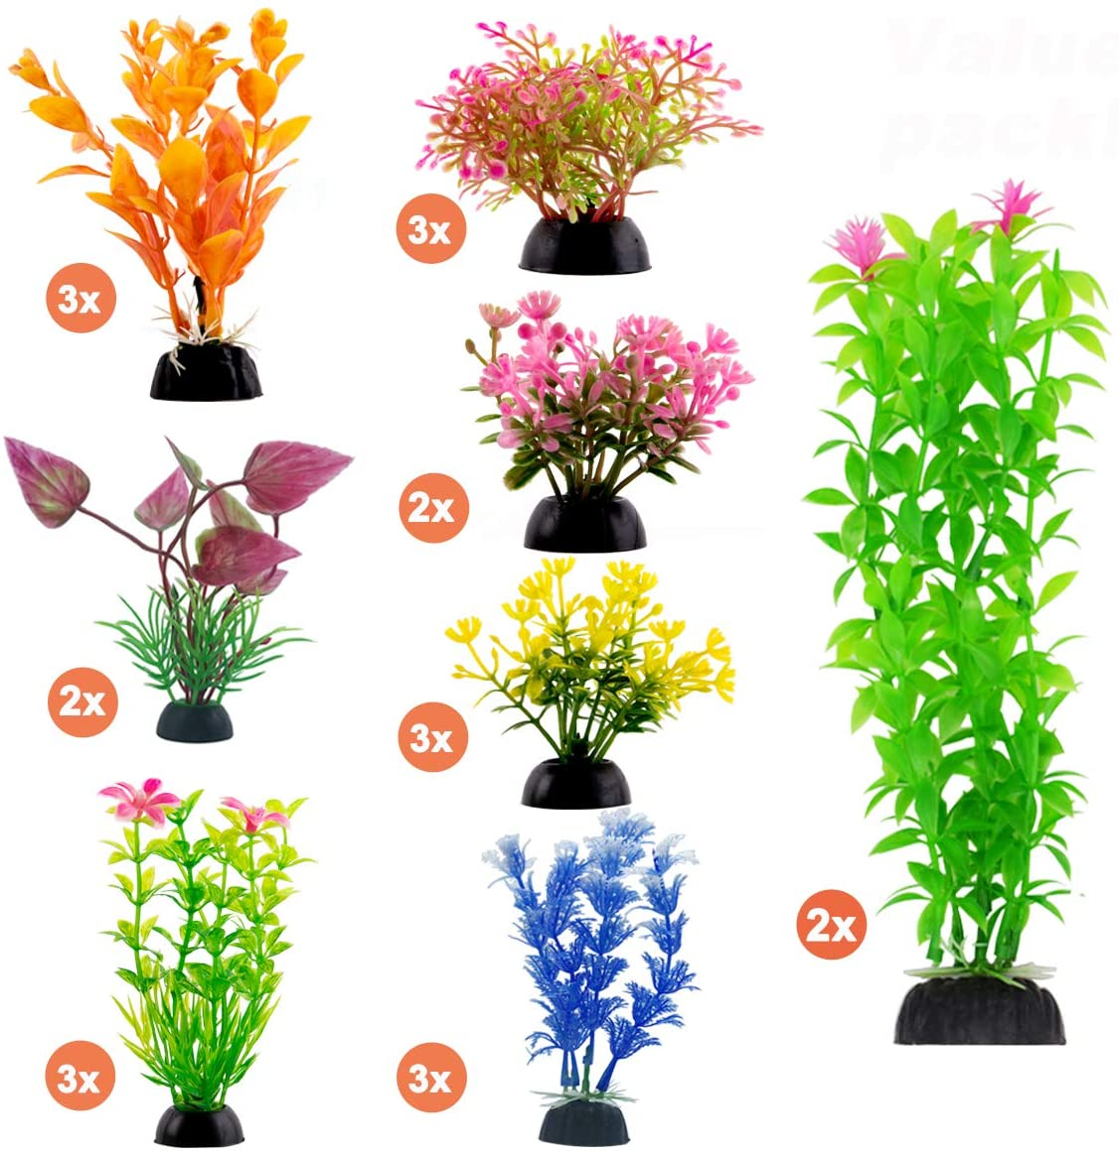 CousDUoBe NEW before 35% OFF selling ☆ Aquarium Decorations 21 Pack Fi Lifelike Plastic Decor